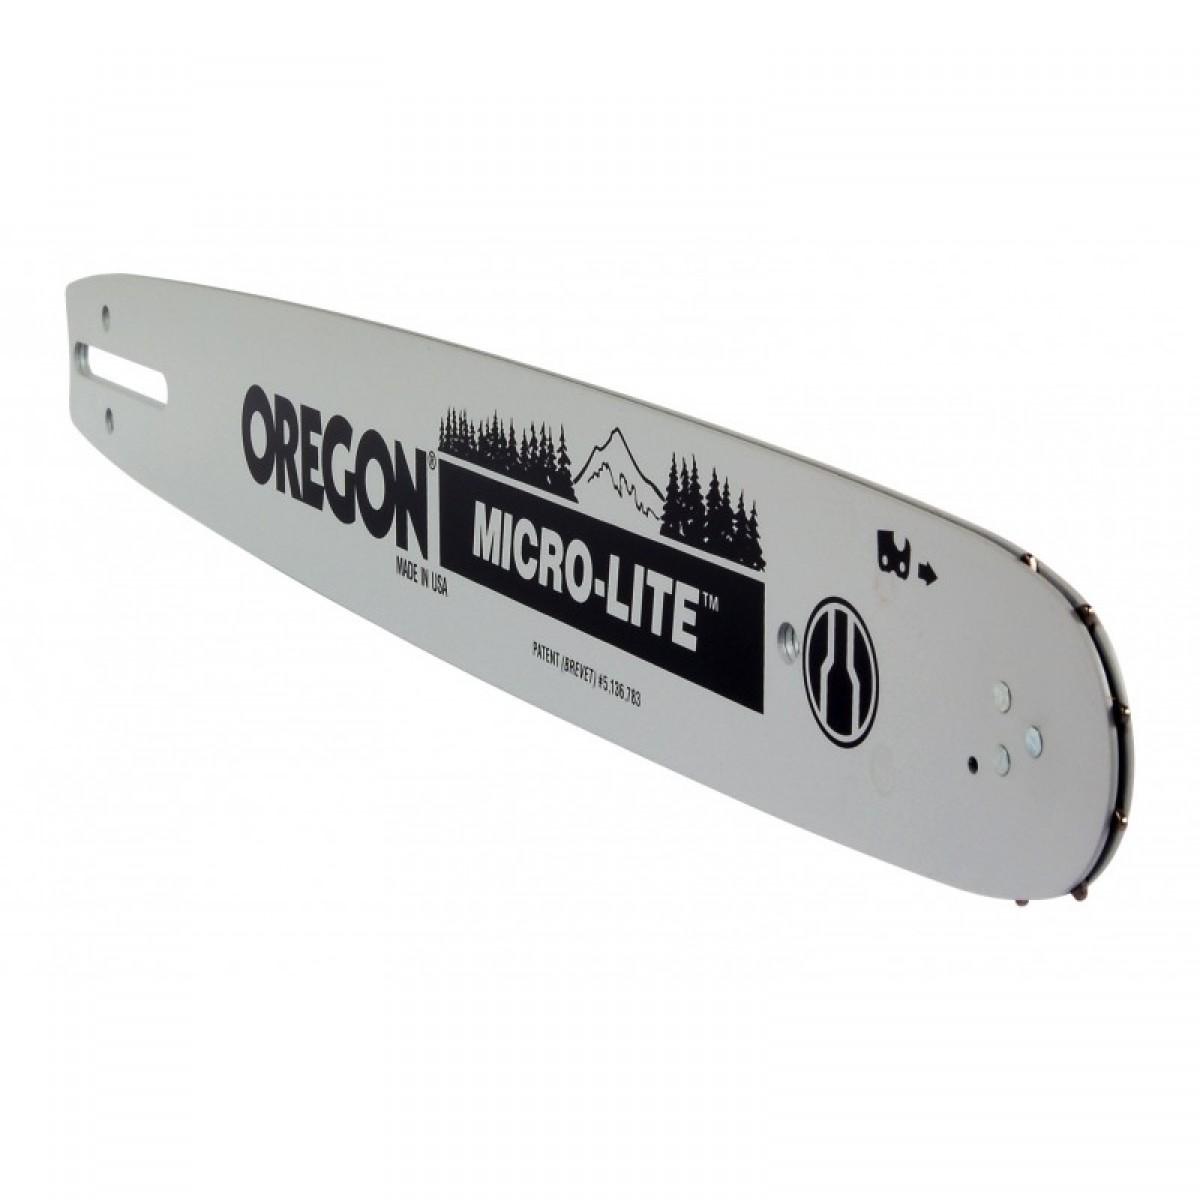 "Vodící lišta MICRO-LITE 15"" (38cm) .325"" 1,3mm 150MPGD025"